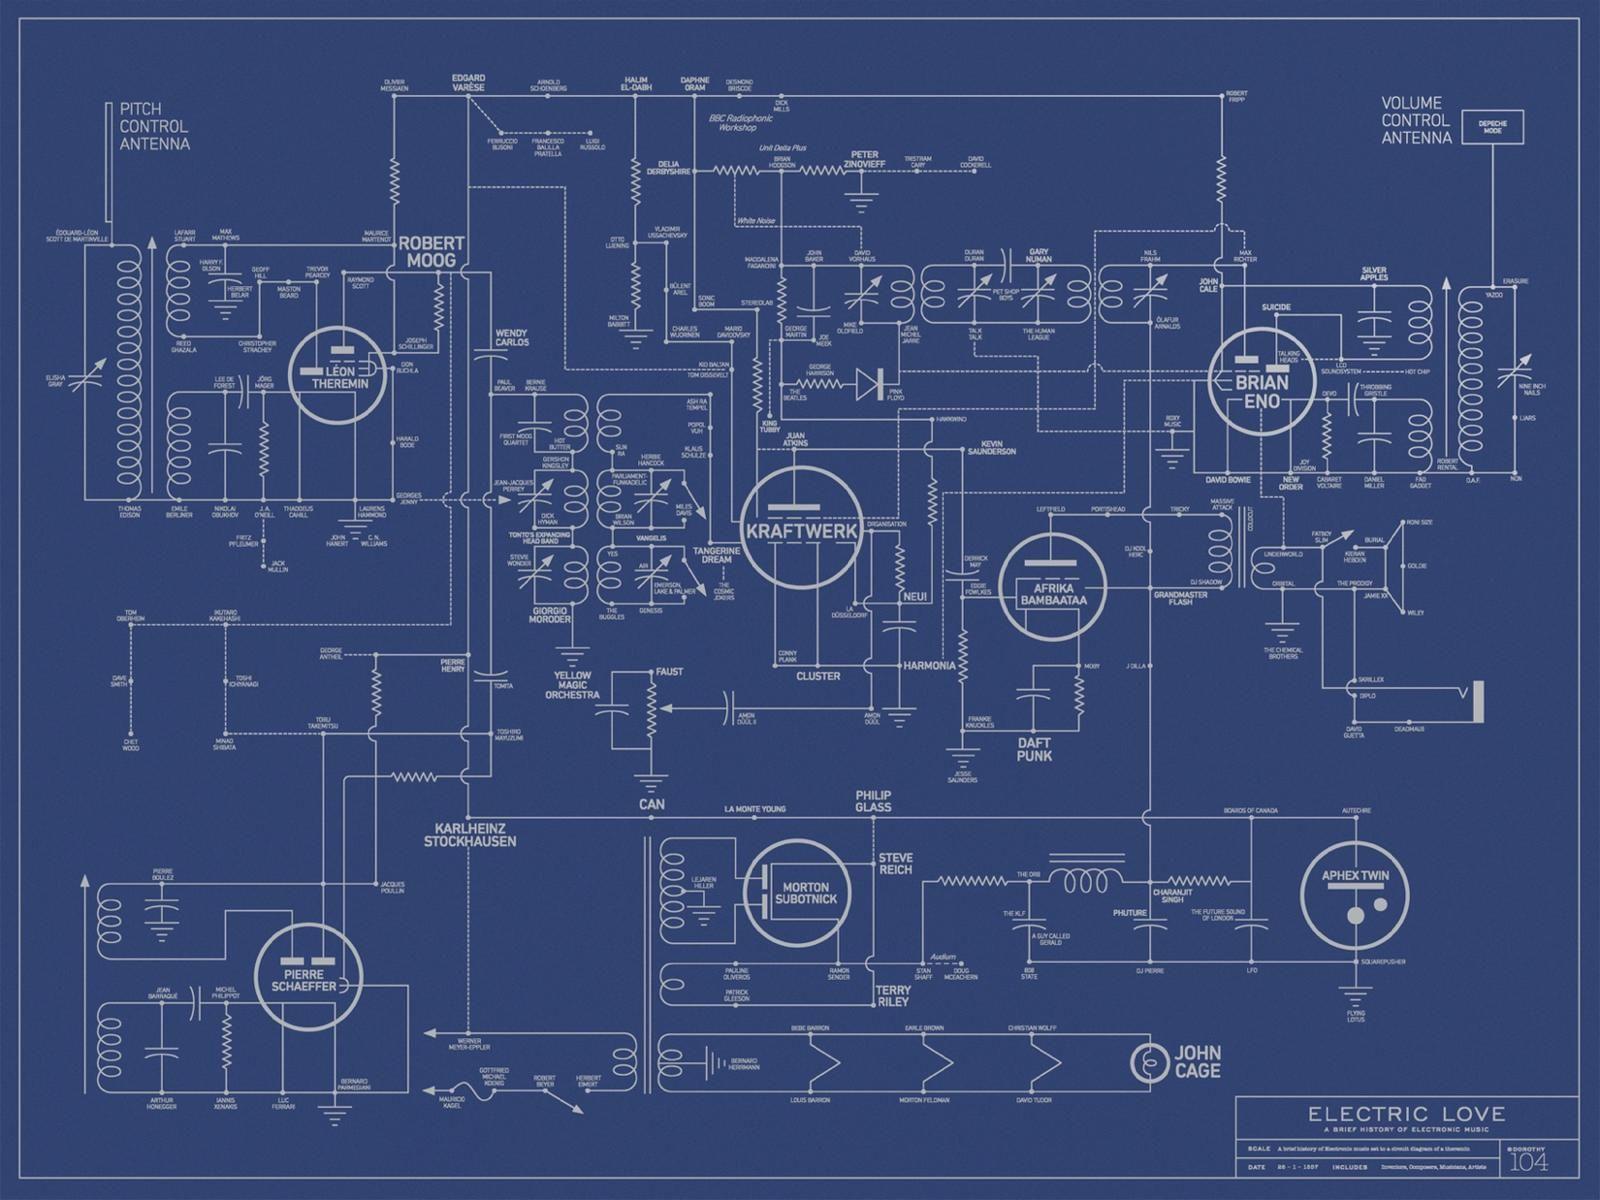 Electric Love Blueprint alt image   Data Visualization   Elektroniken, Musik, Infografik